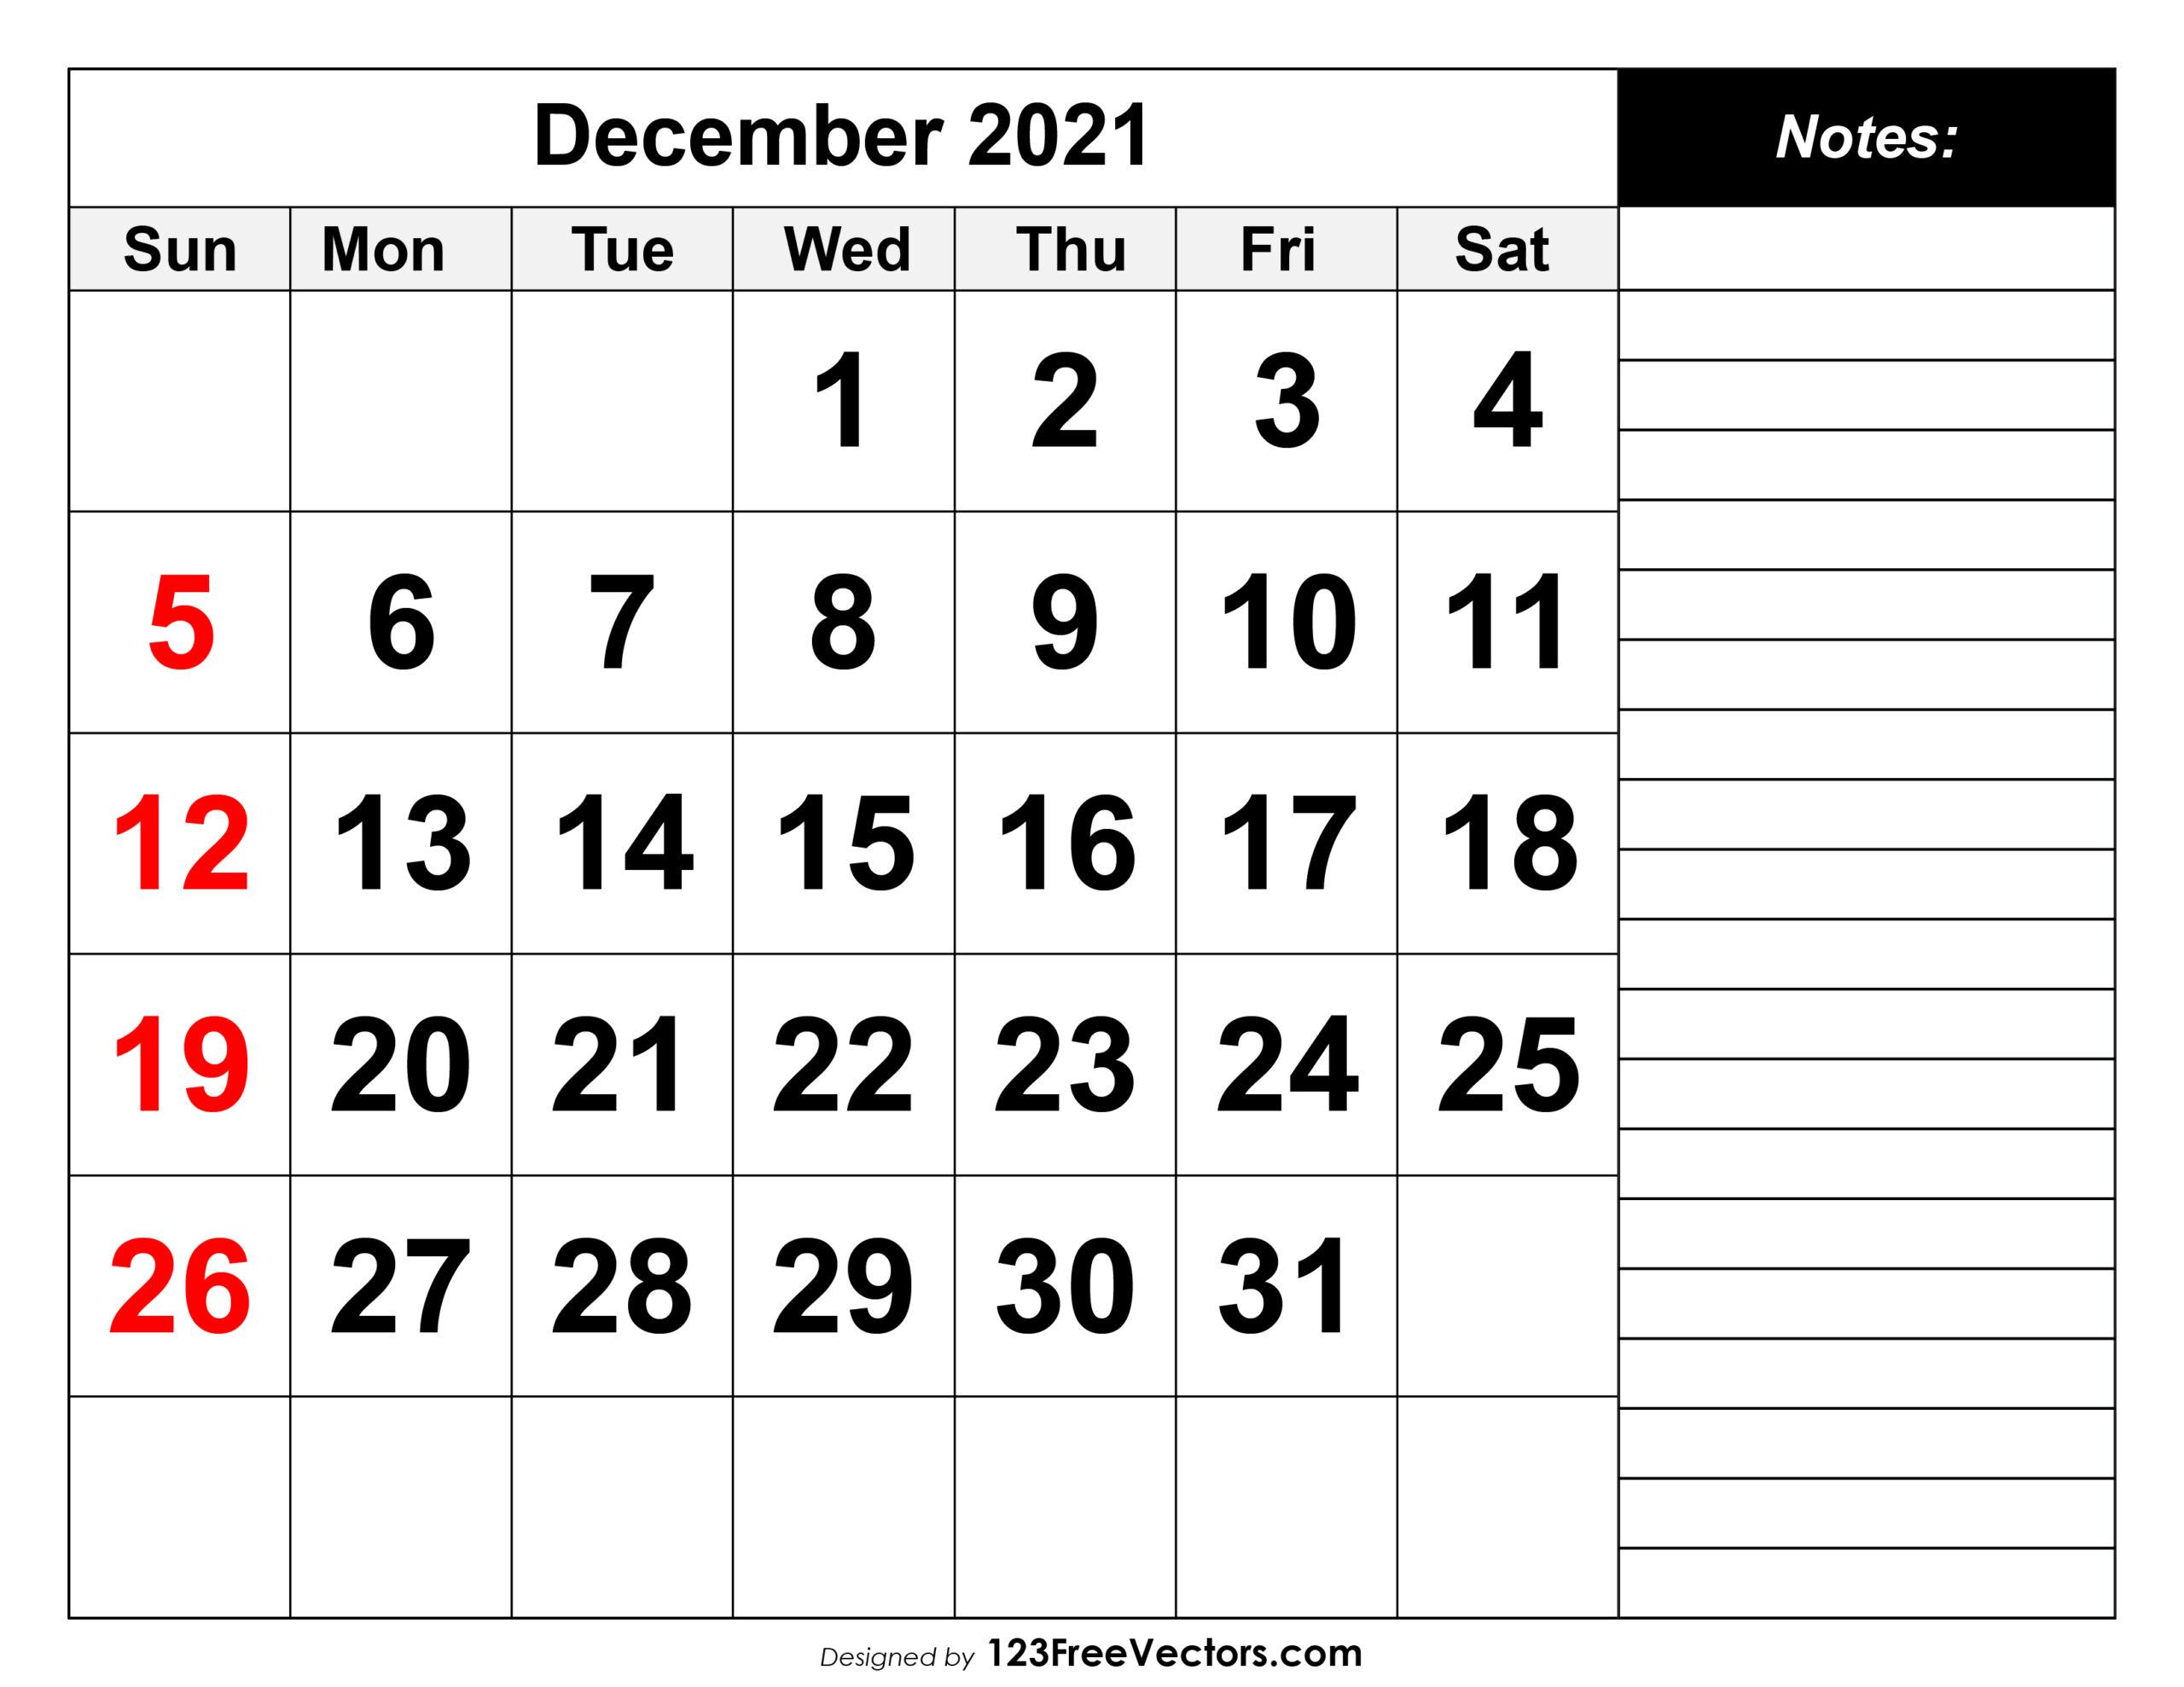 Free December 2021 Printable Calendar